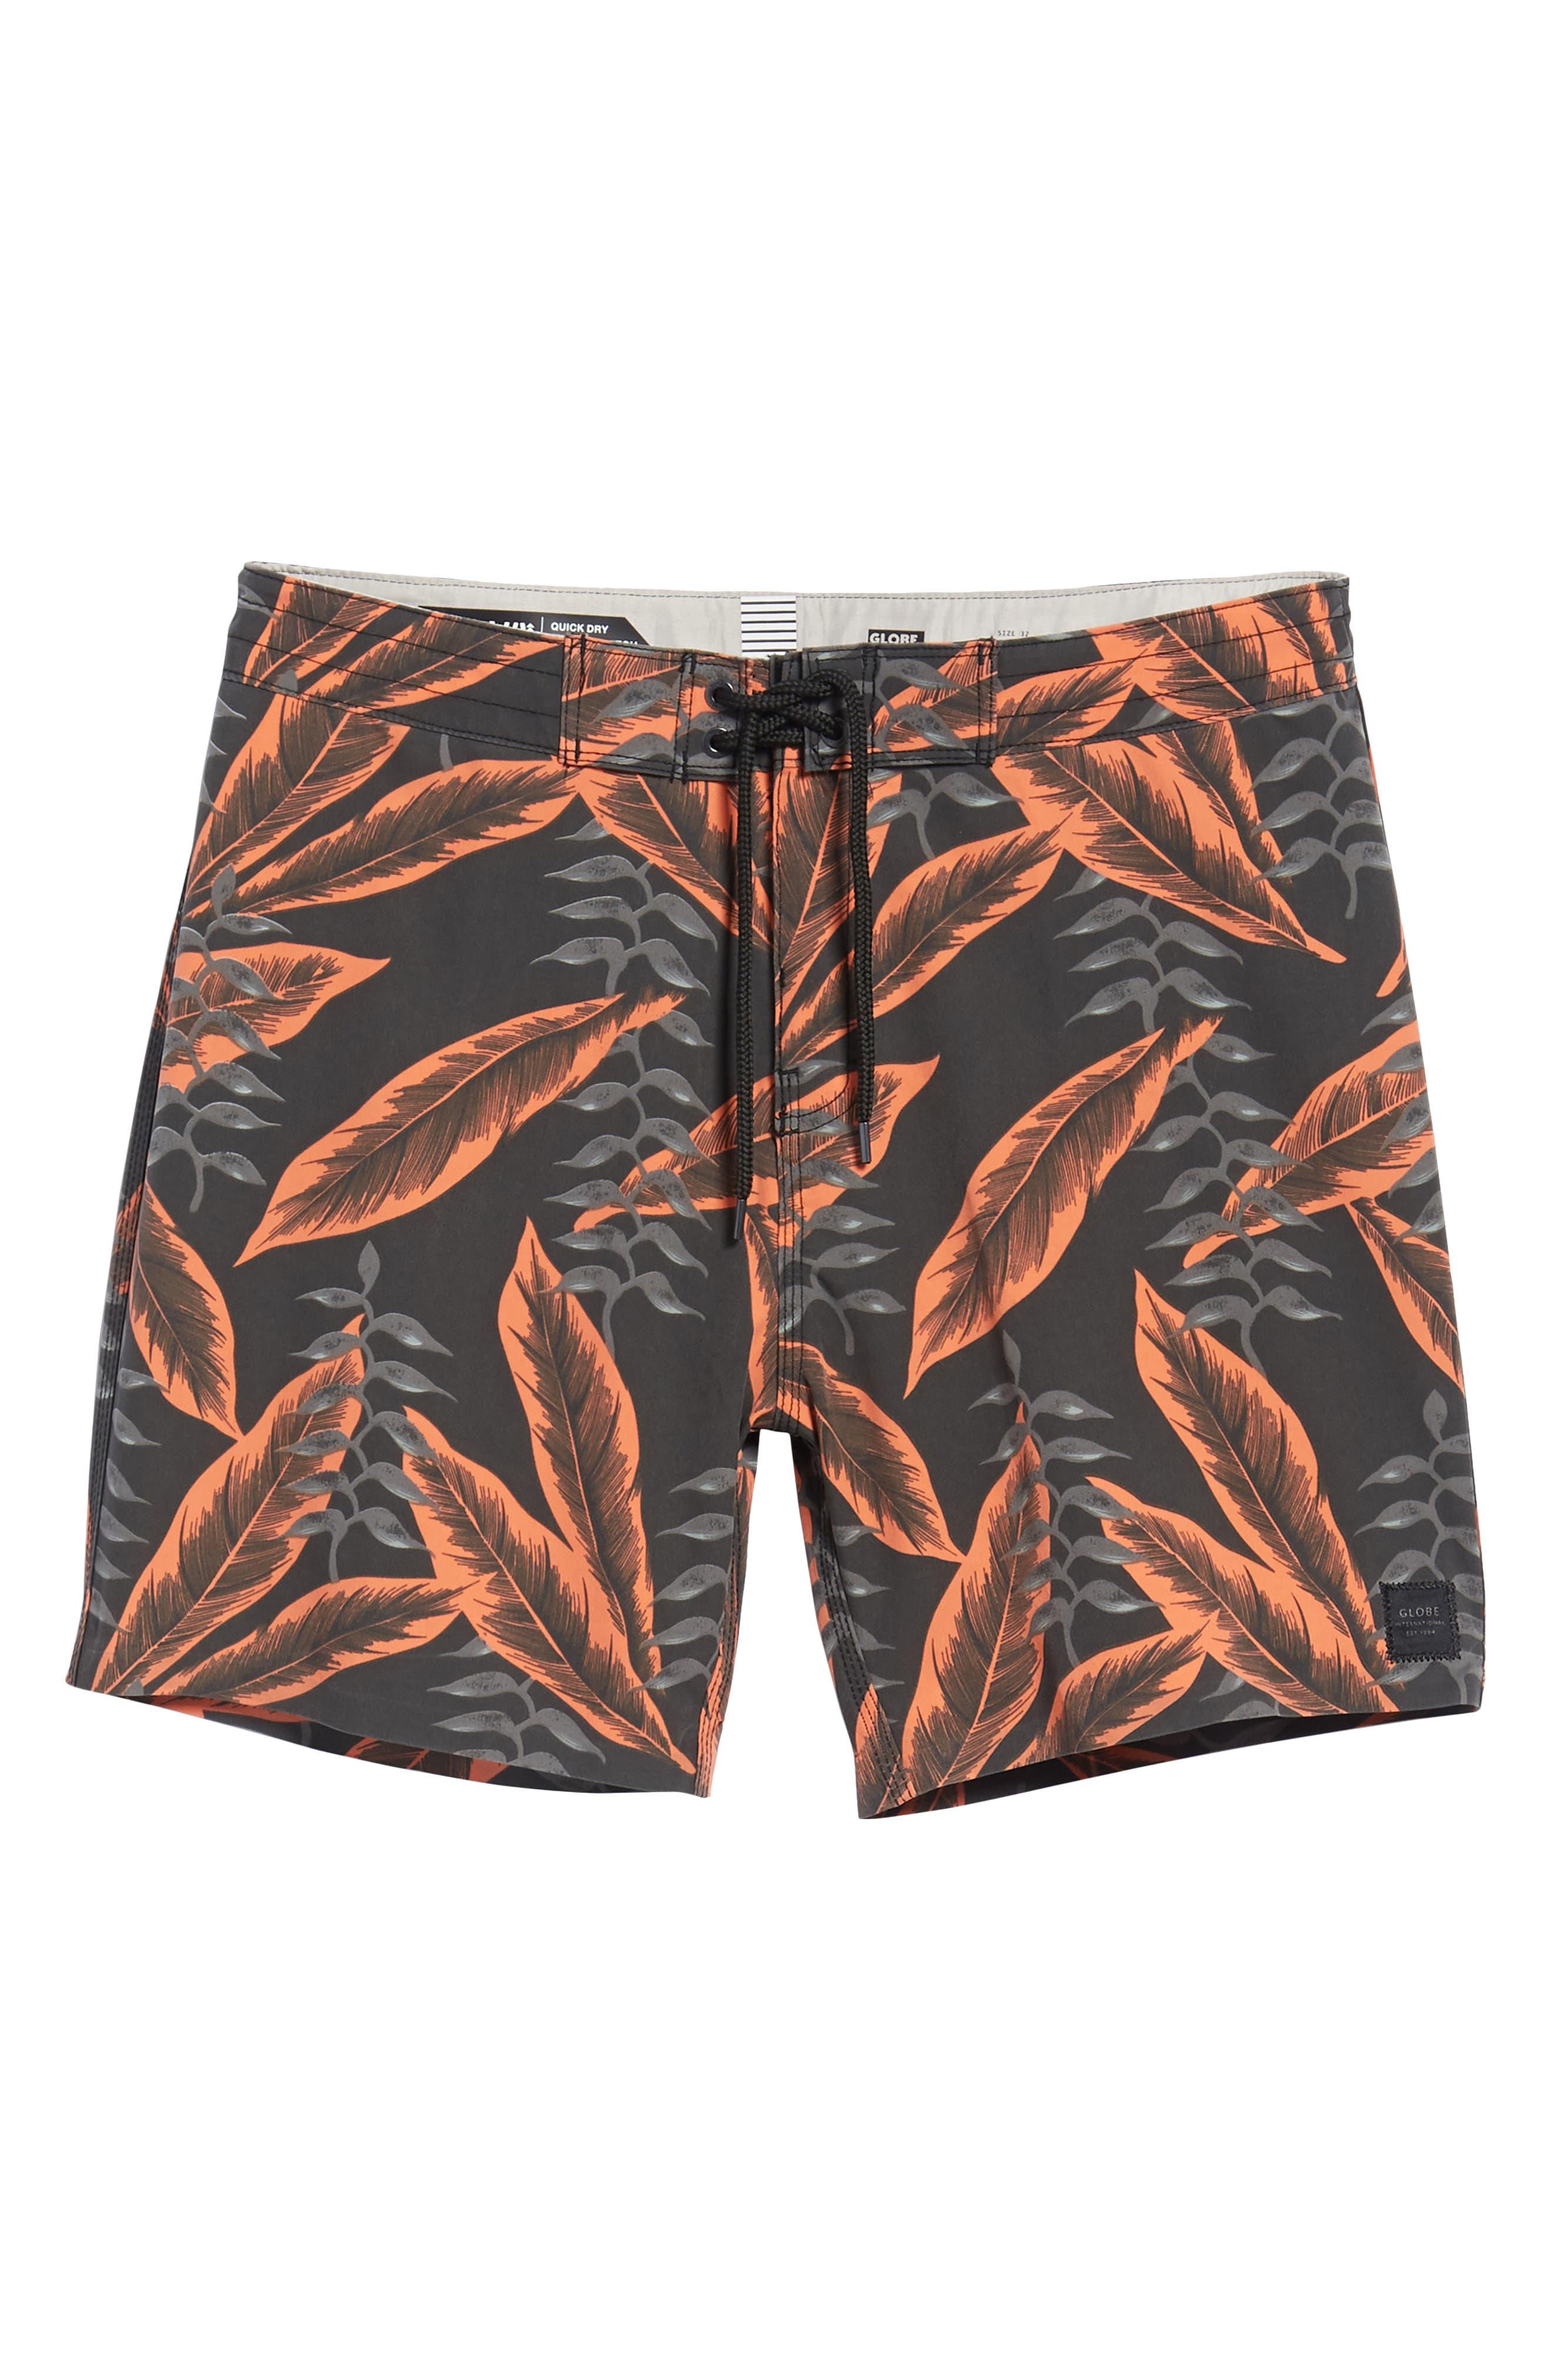 Shangri-La 3.0 Board Shorts,                             Alternate thumbnail 6, color,                             001